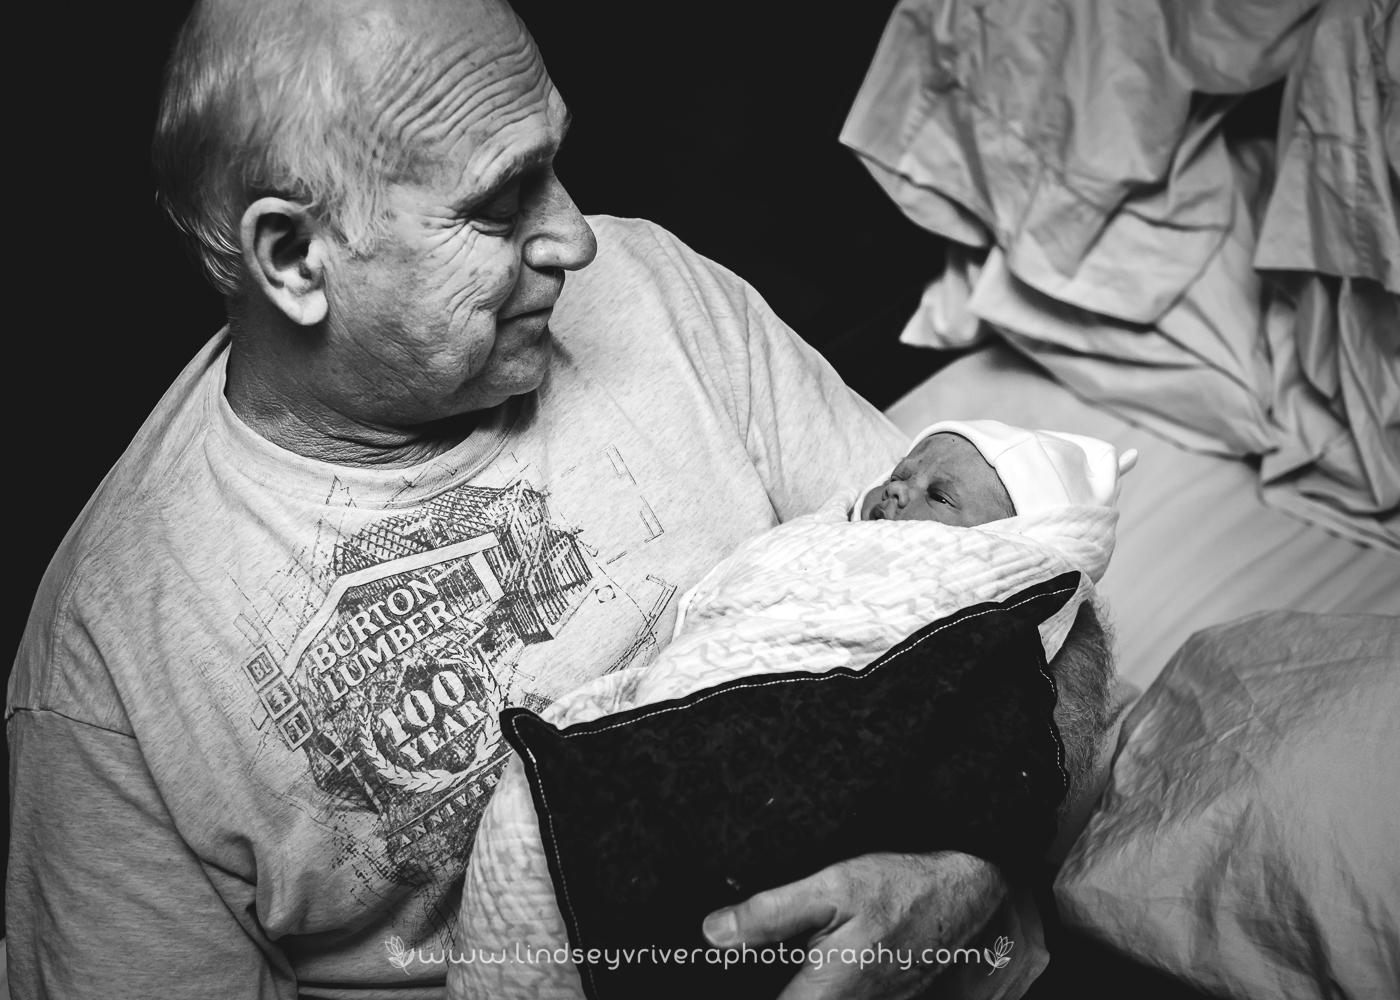 Home-Birth-Born-Photography-Salt-Lake-City,-Wasatch-Midwifery-&-Wellness,-Just-Born74.jpg